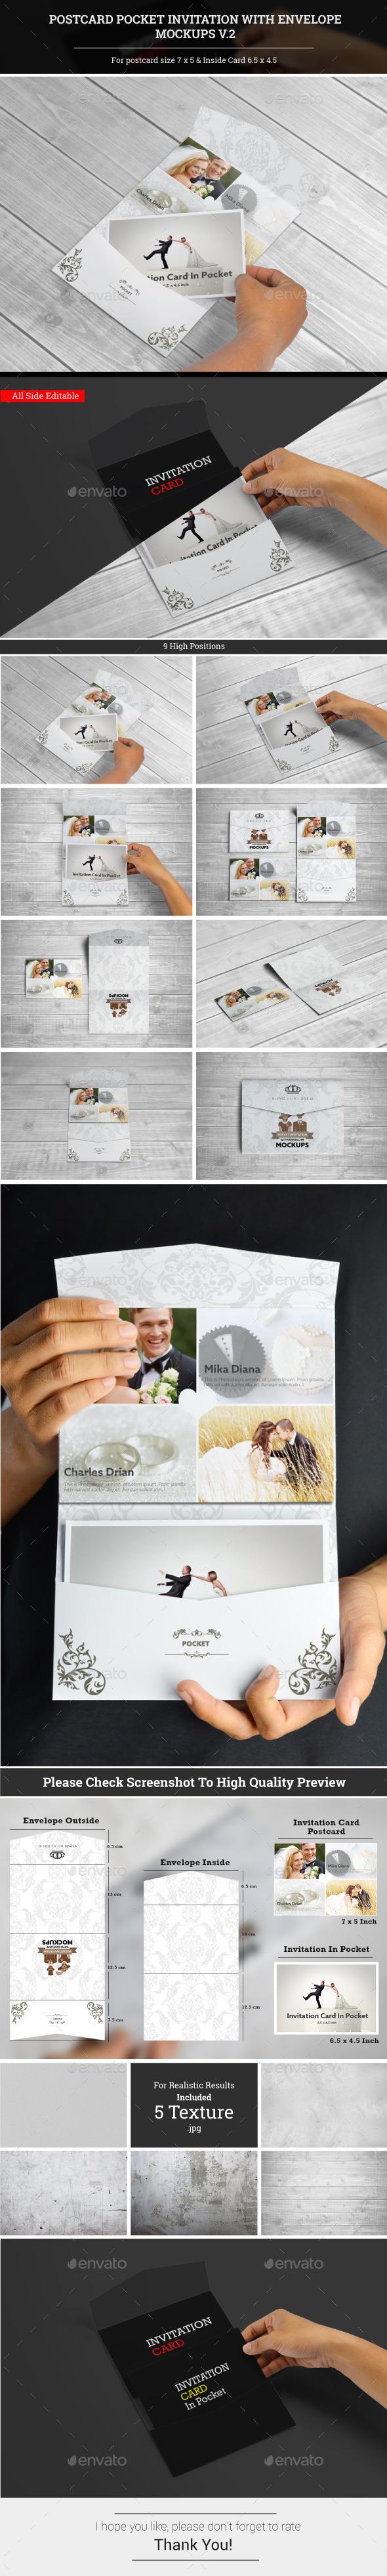 Postcard Pocket Invite With Envelope Mockups V.2 - Miscellaneous Print